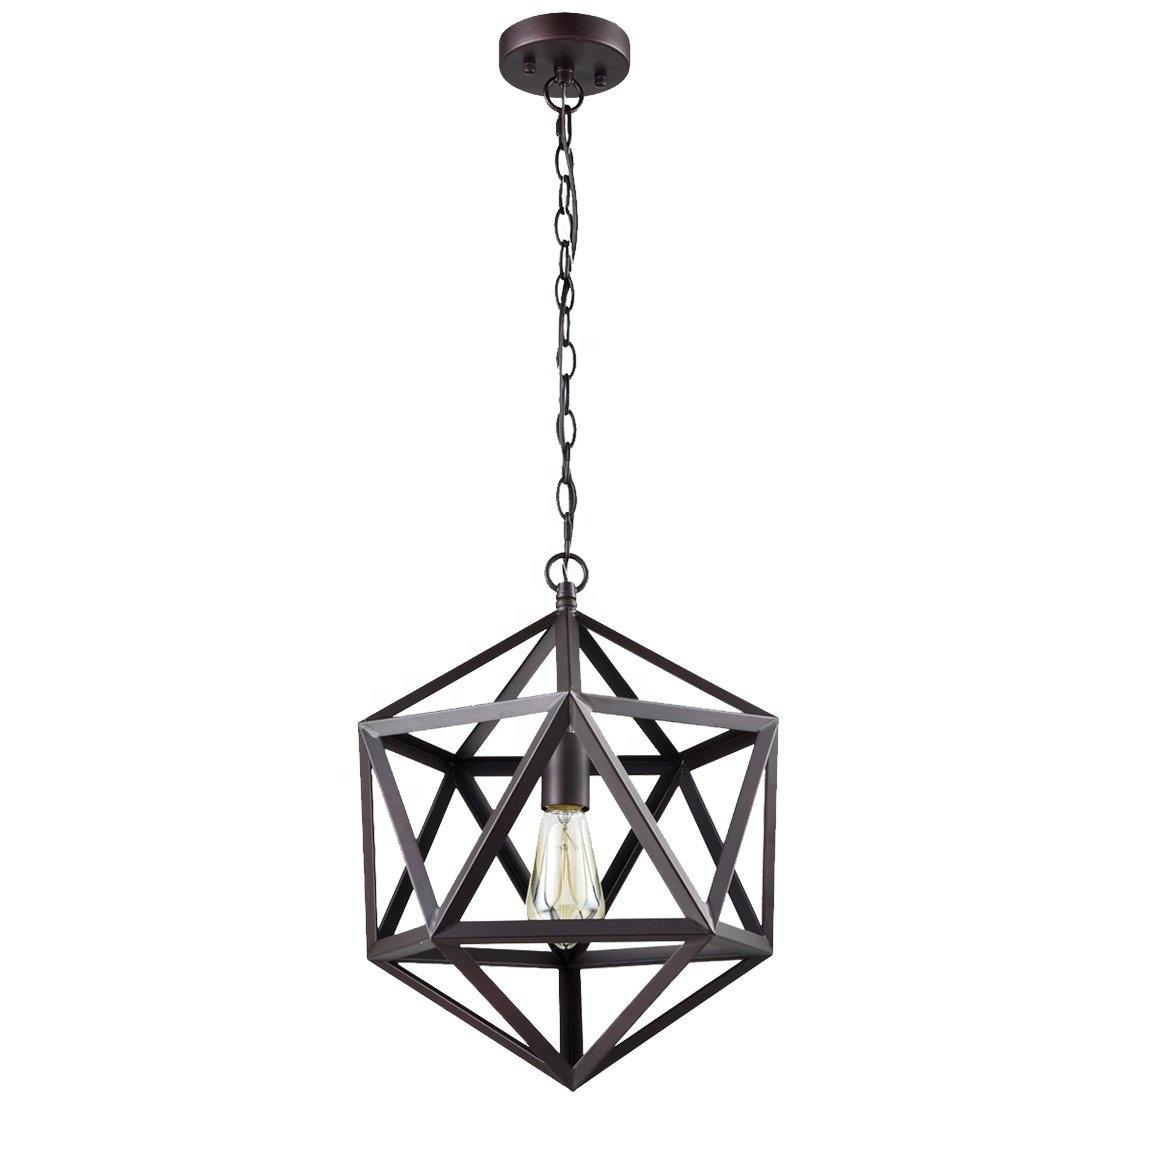 Modern Vintage Loft Rustic Hanging Metal Iron Lighting Fixtures Geometric Cage Pendant Light Chandelier Ceiling Lamp